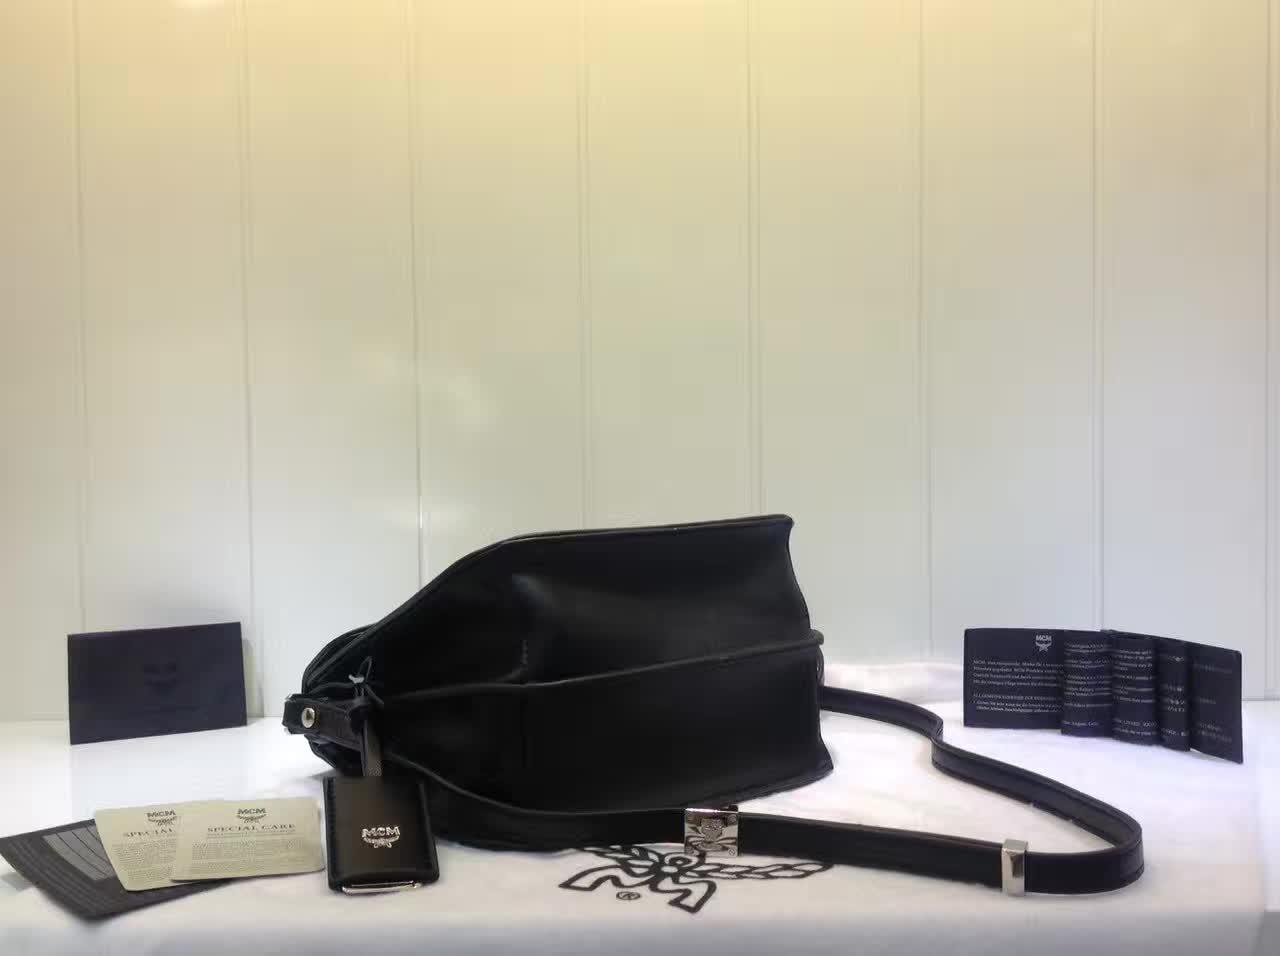 MCM官网 Patricia系列邮差包 外观简约时尚 翻绒内里 实用多隔层 黑色